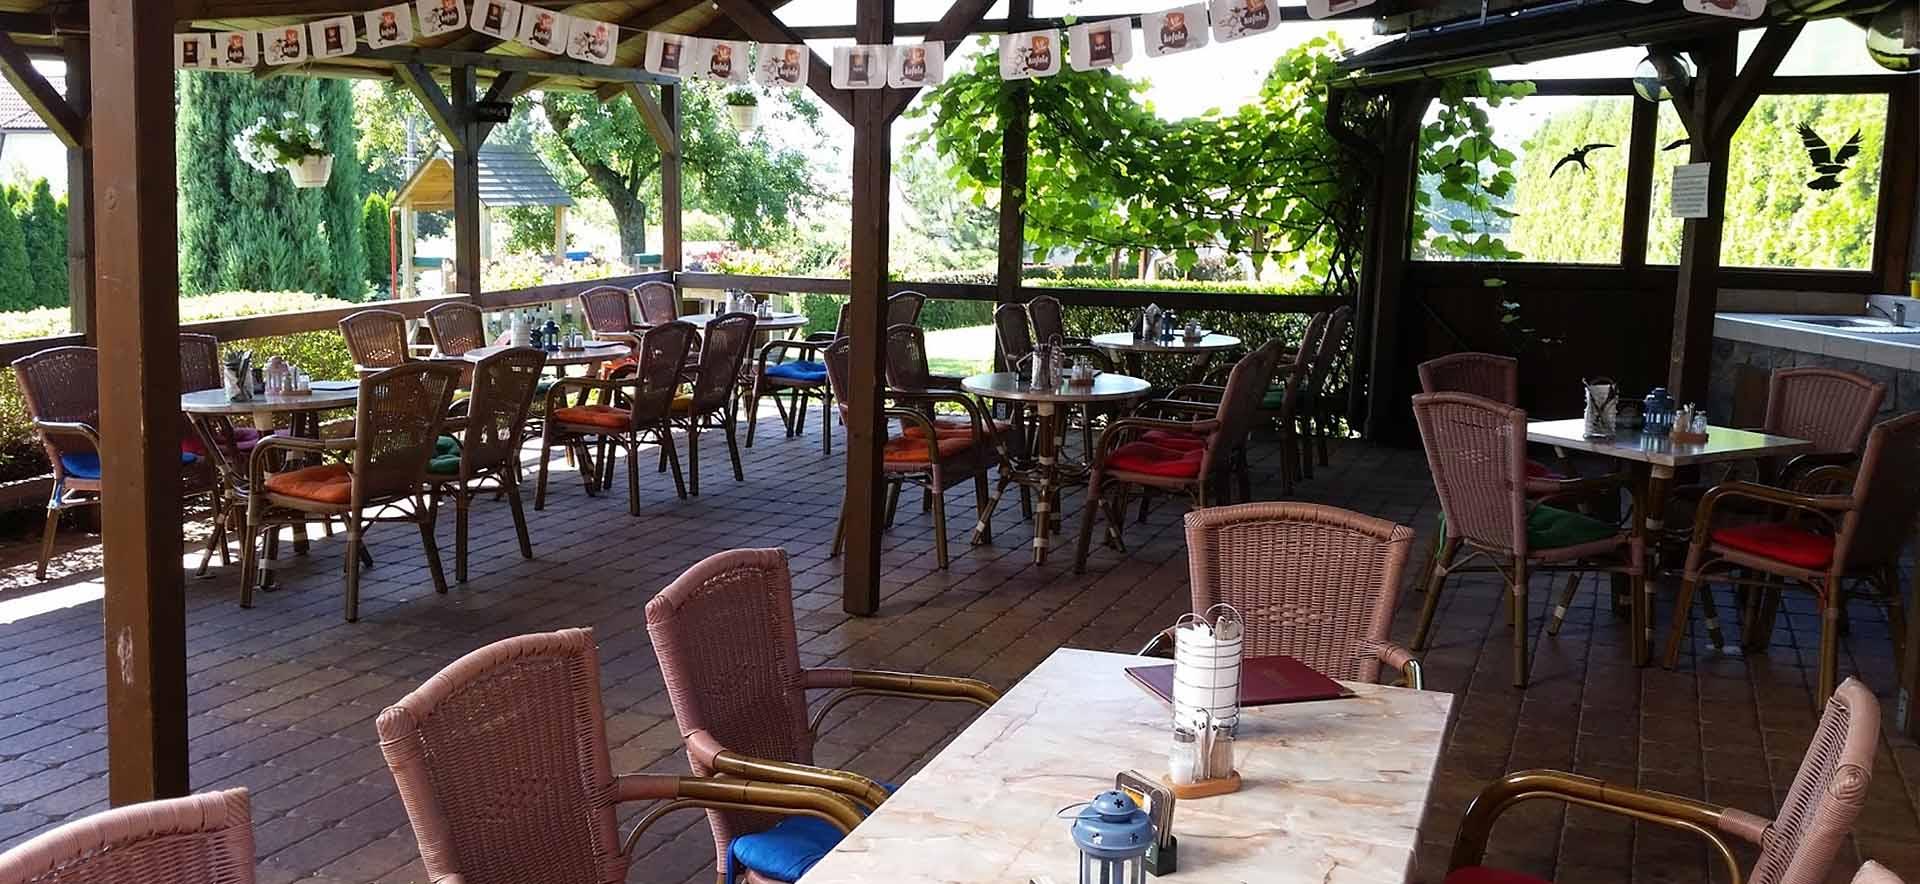 Restaurace, Rychvald